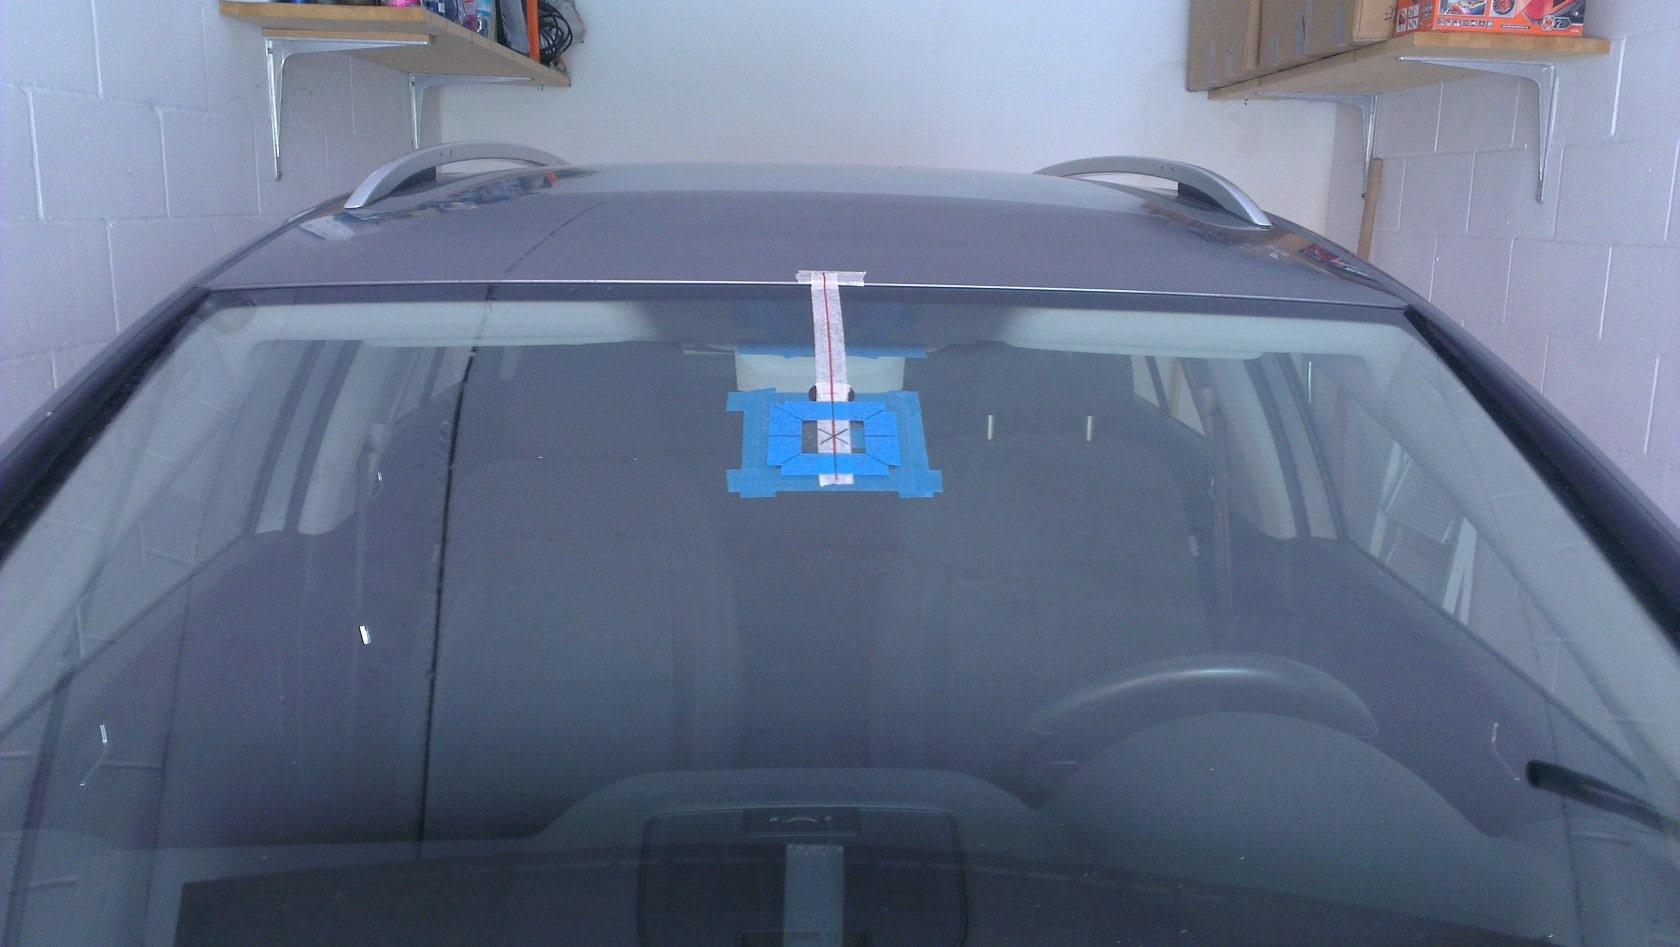 Diy Installing Oem Rain Light Sensor Auto Dimming Rearview Mirror Wiring A